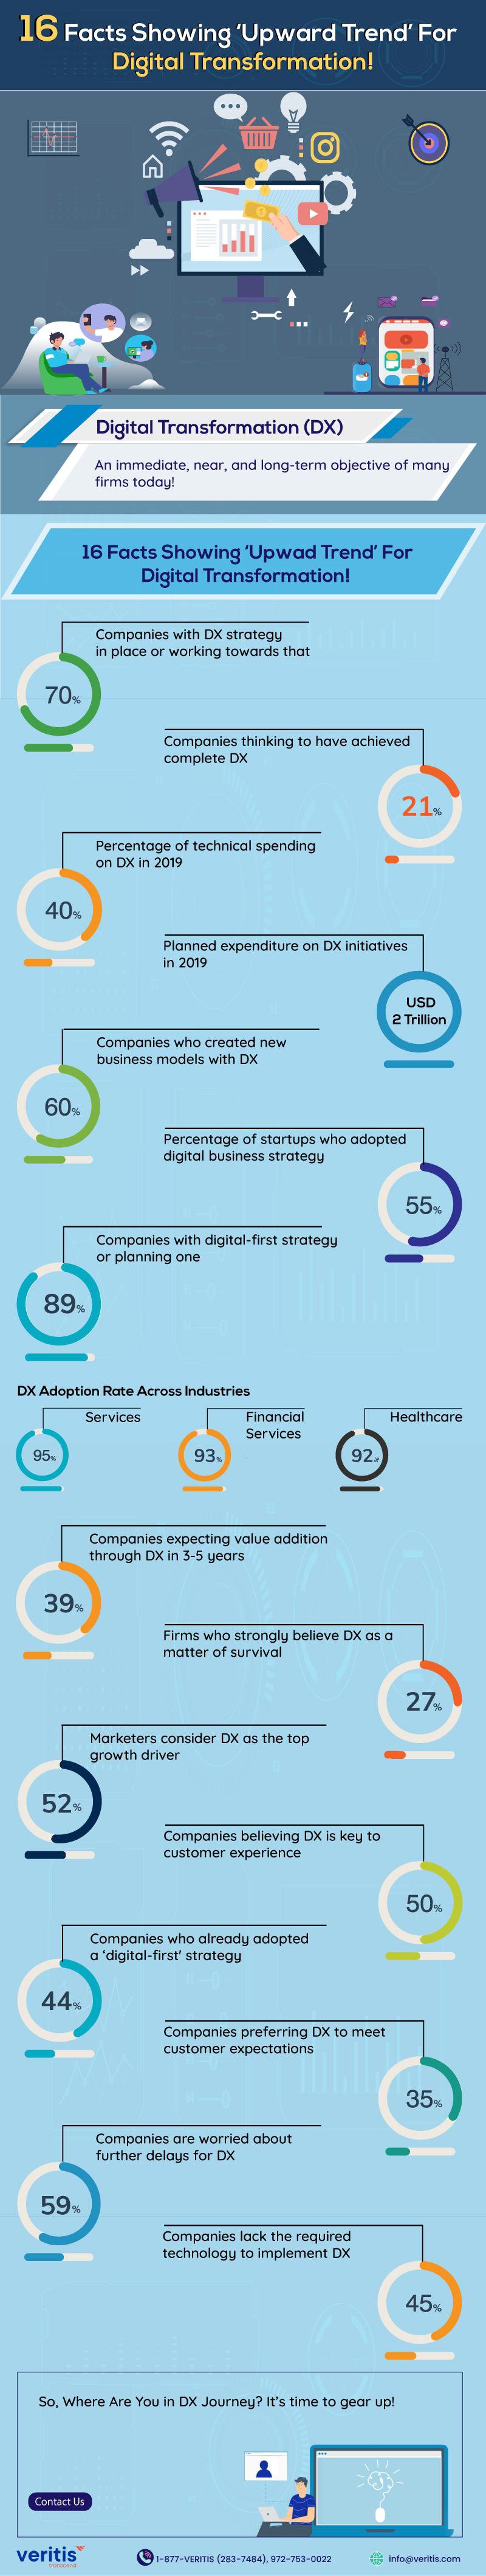 16 facts showing 'upward trend' digital transformation